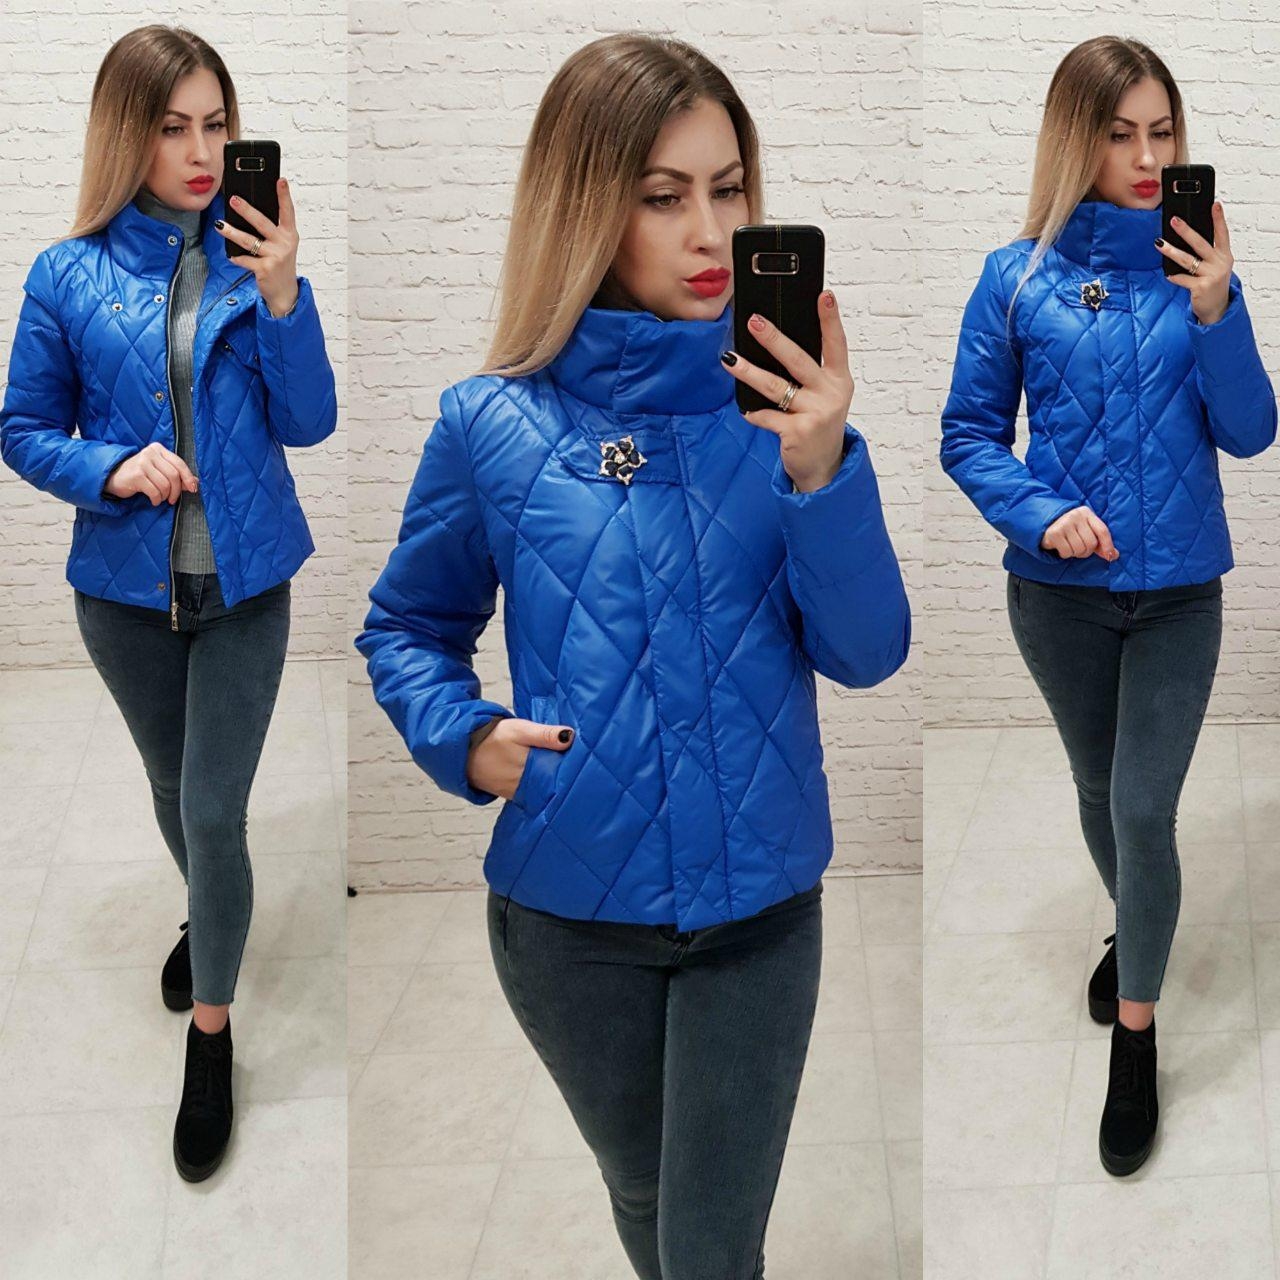 Демисезонная куртка 2019 ,арт. 502, цвет электрик